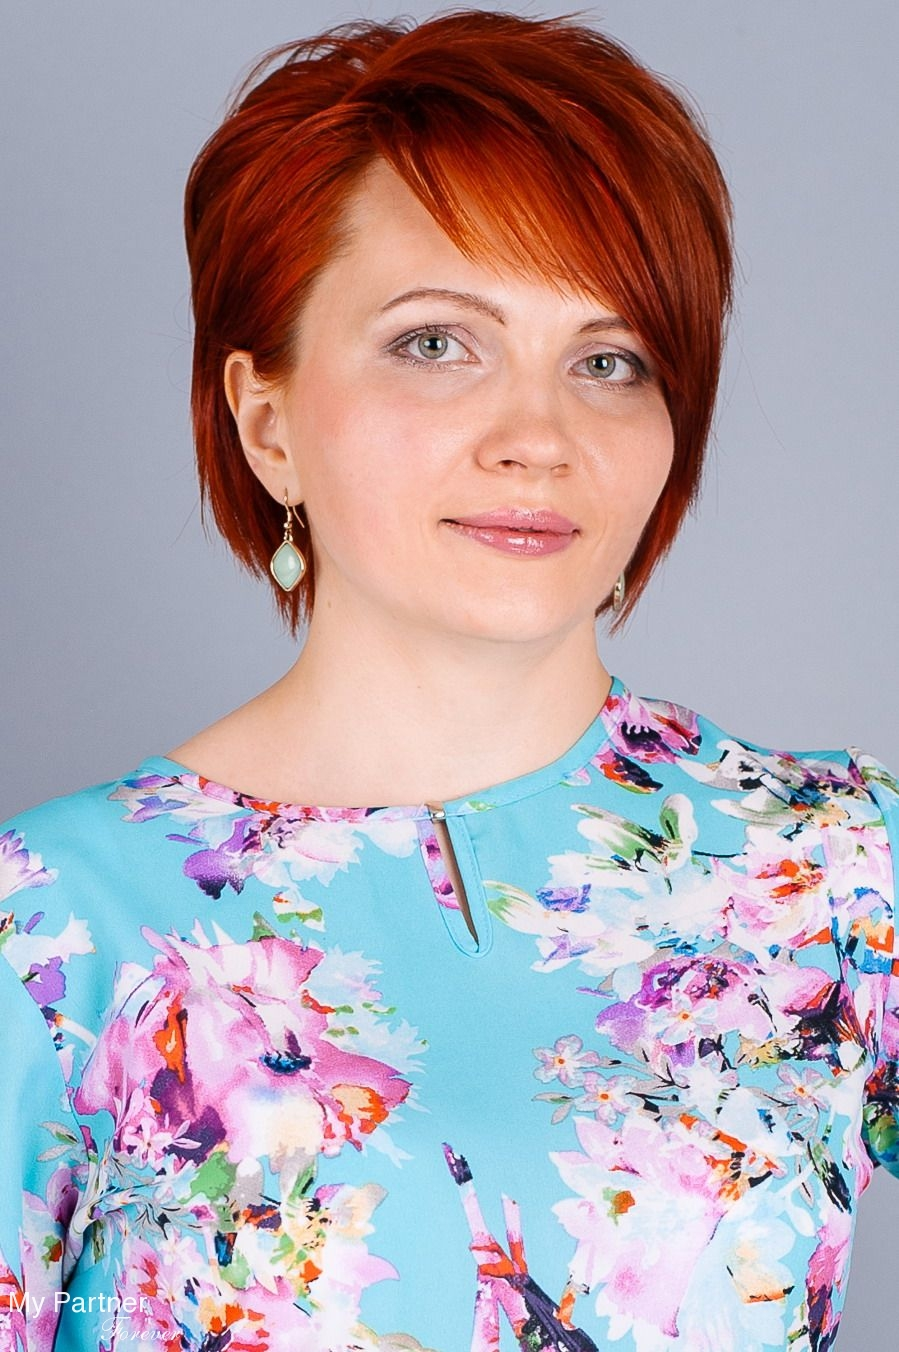 belarus dating free site 2015